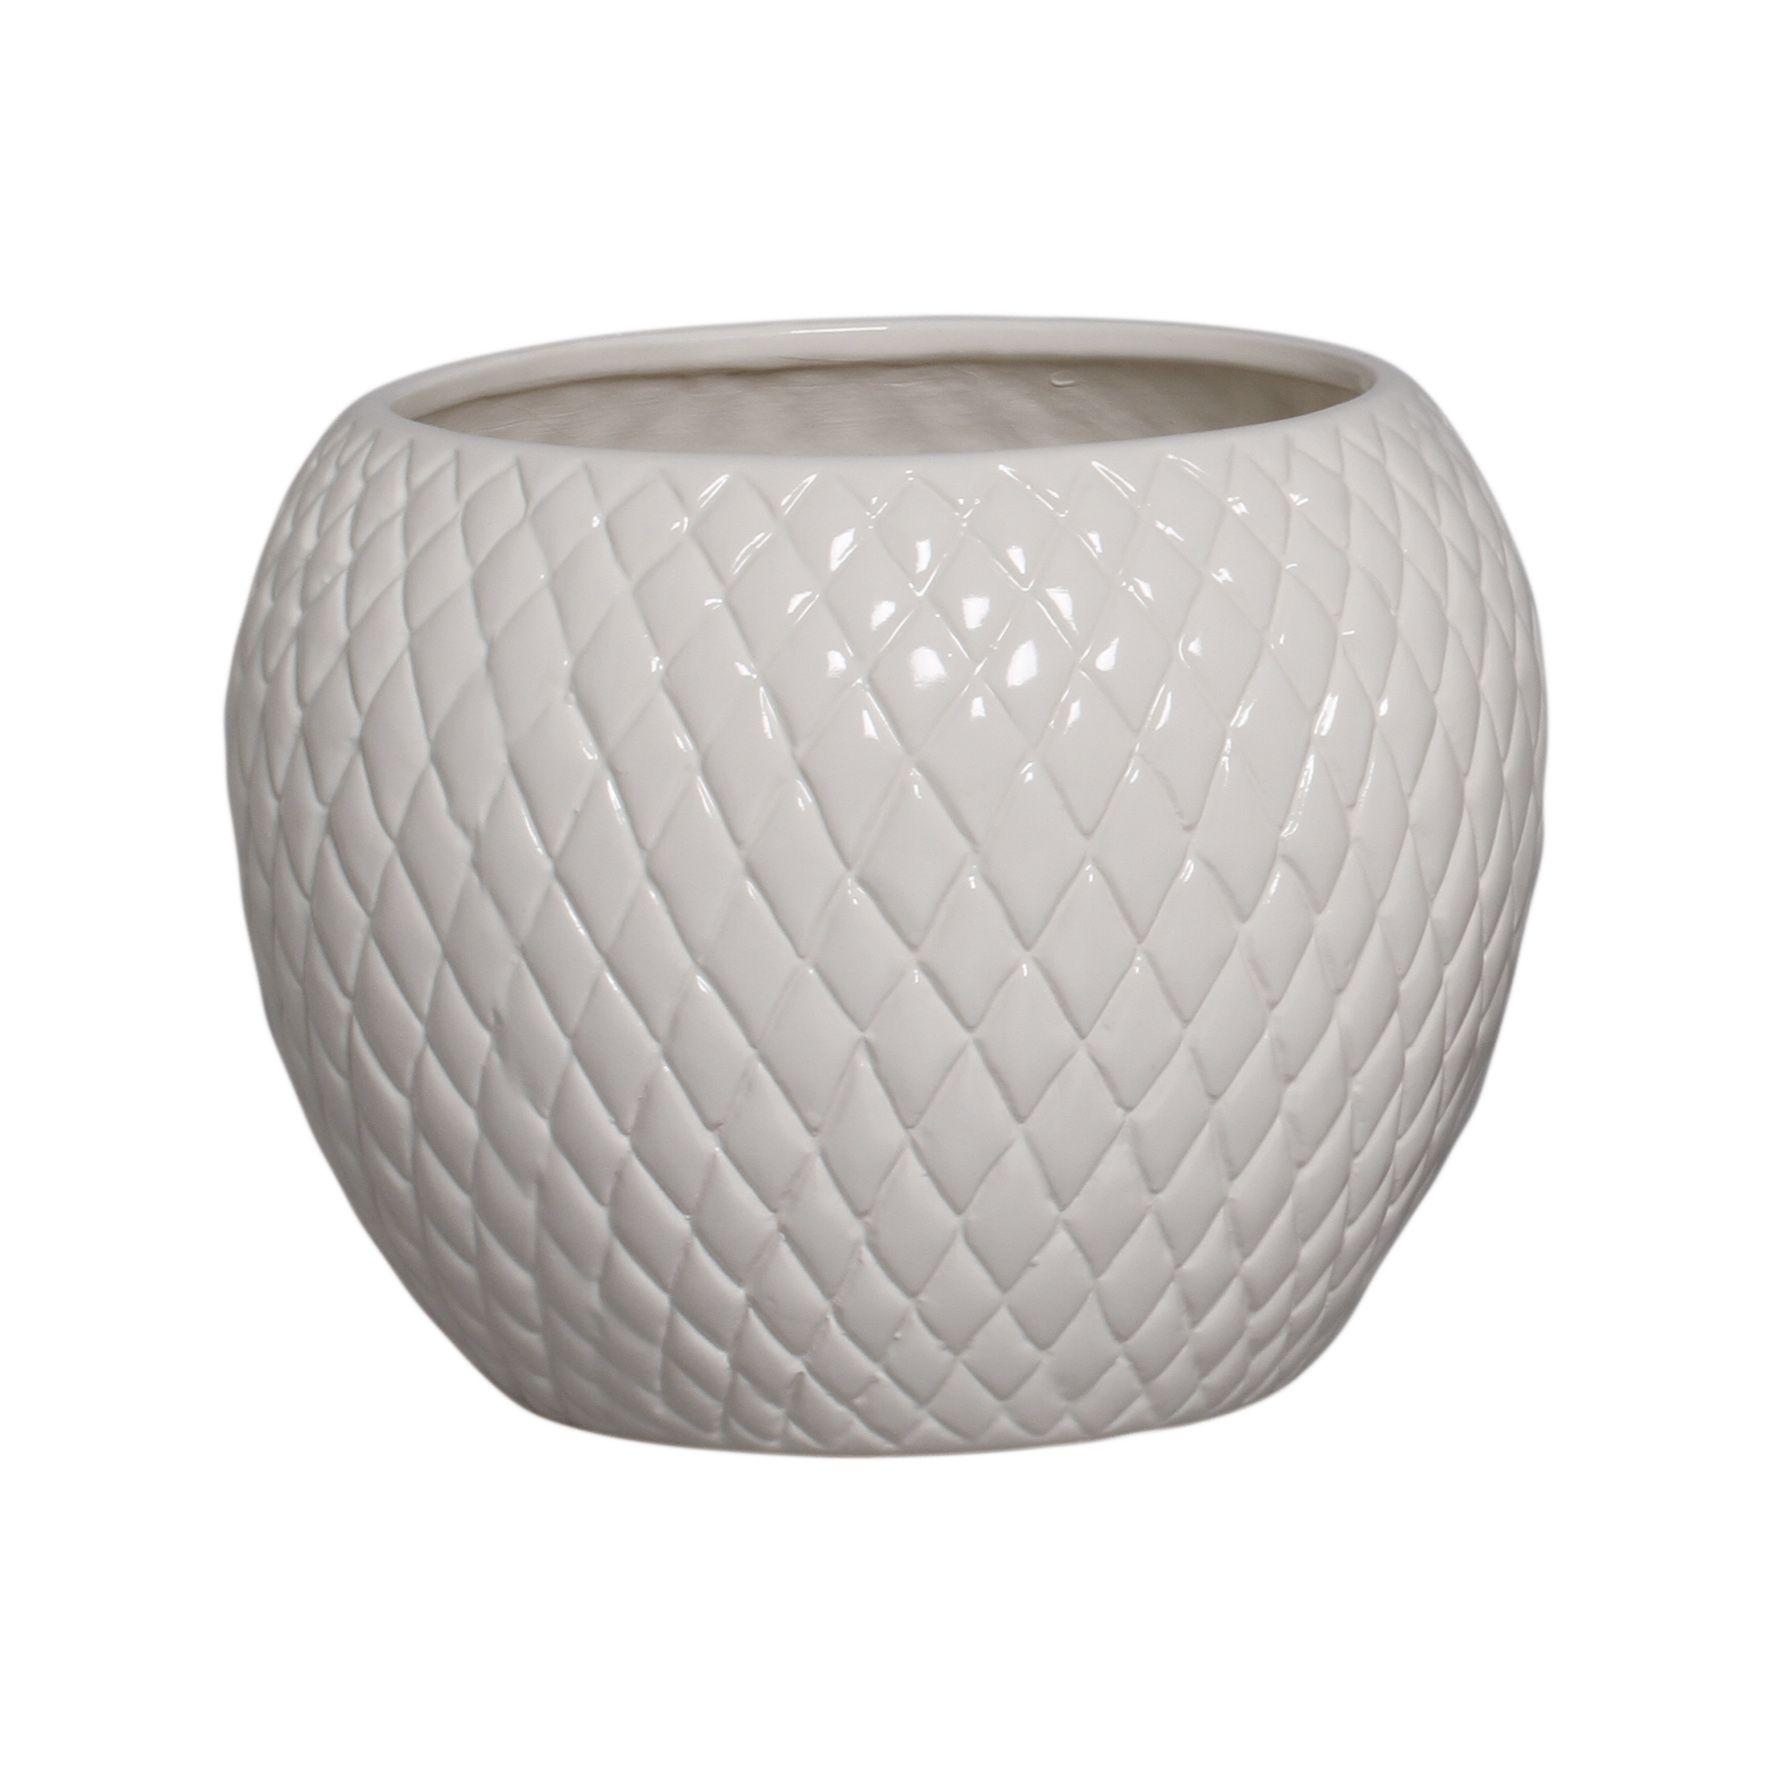 Cachepot de Cerâmica Crema Claro G 18,7x24,5 cm